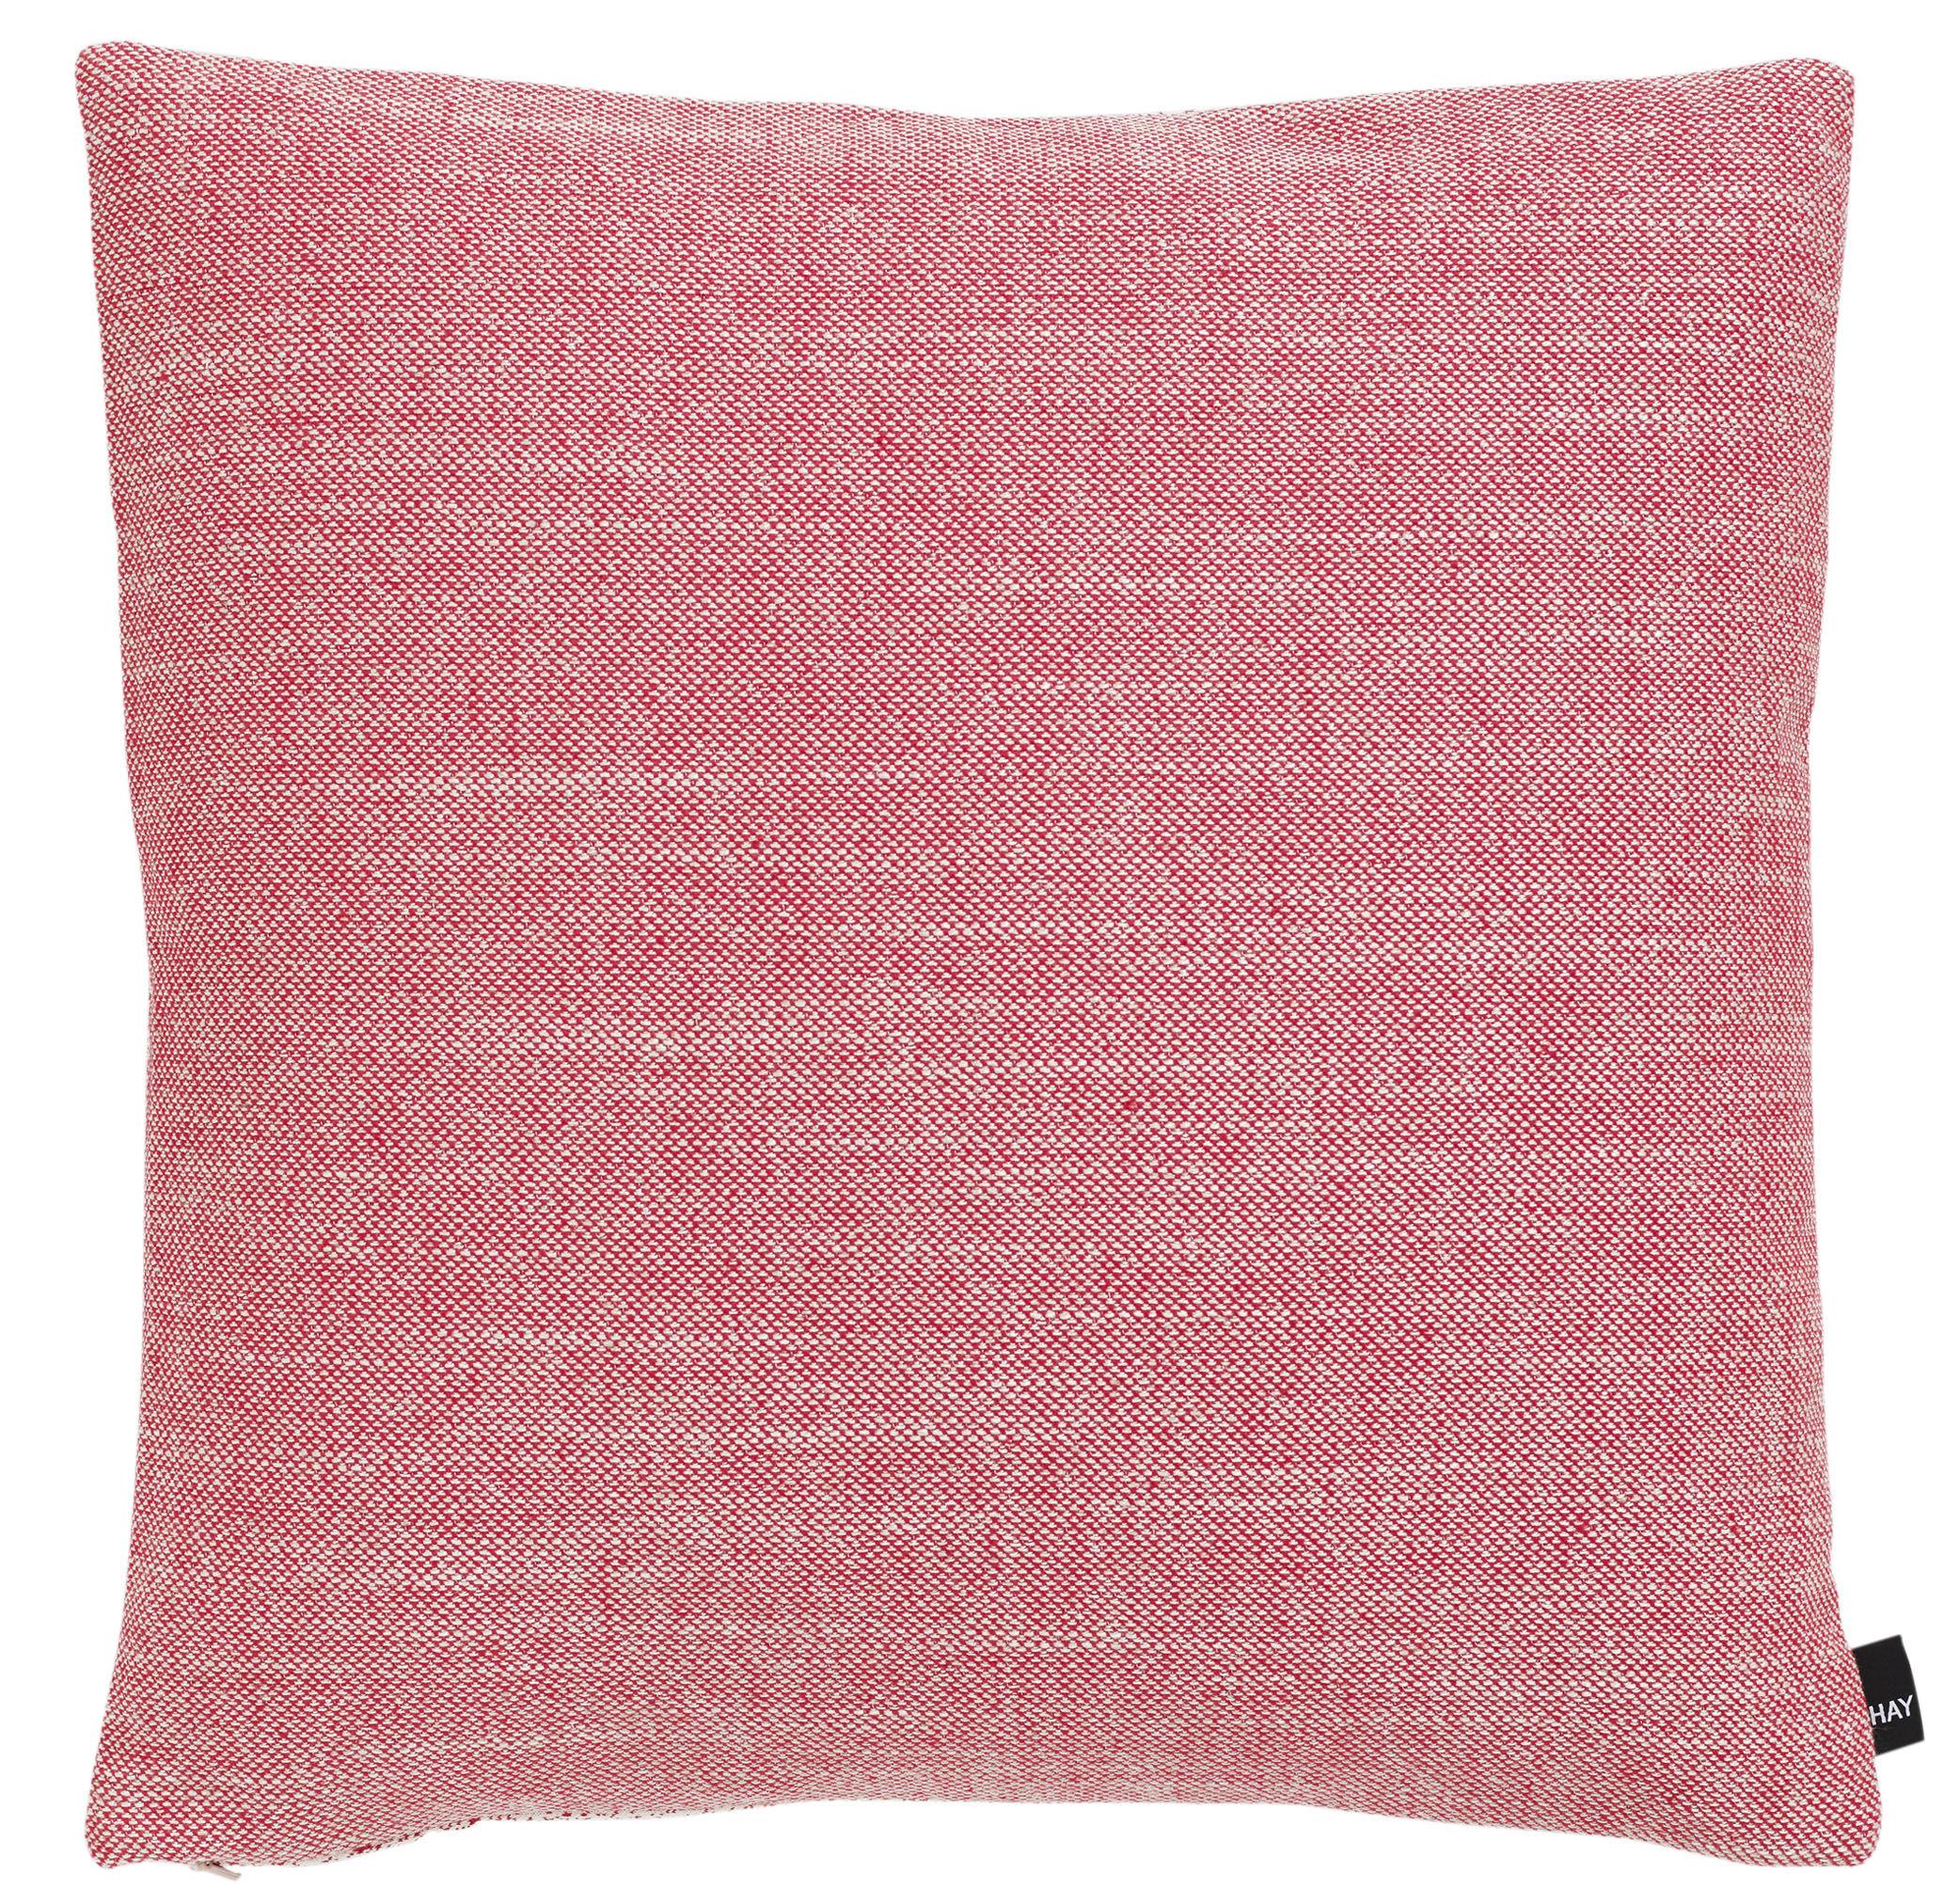 Déco - Coussins - Coussin Eclectic / 50 x 50 cm - Hay - Rose - Laine, Plumes, Polyester